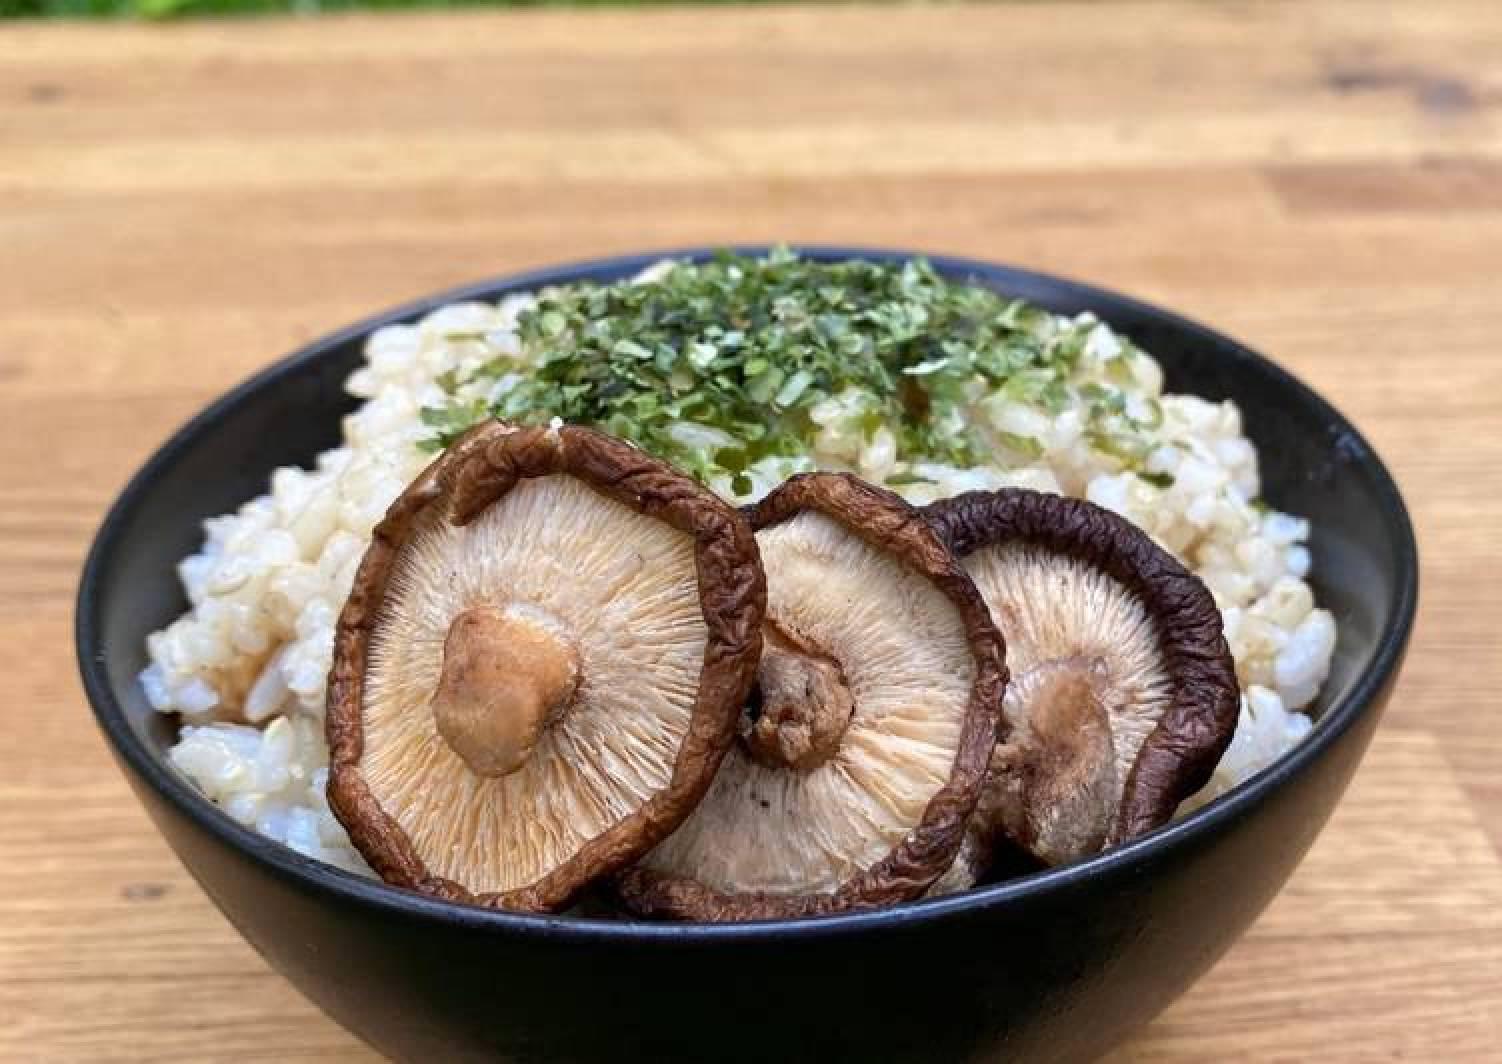 Brown Rice with Aonori Seaweed and Miso Mushrooms